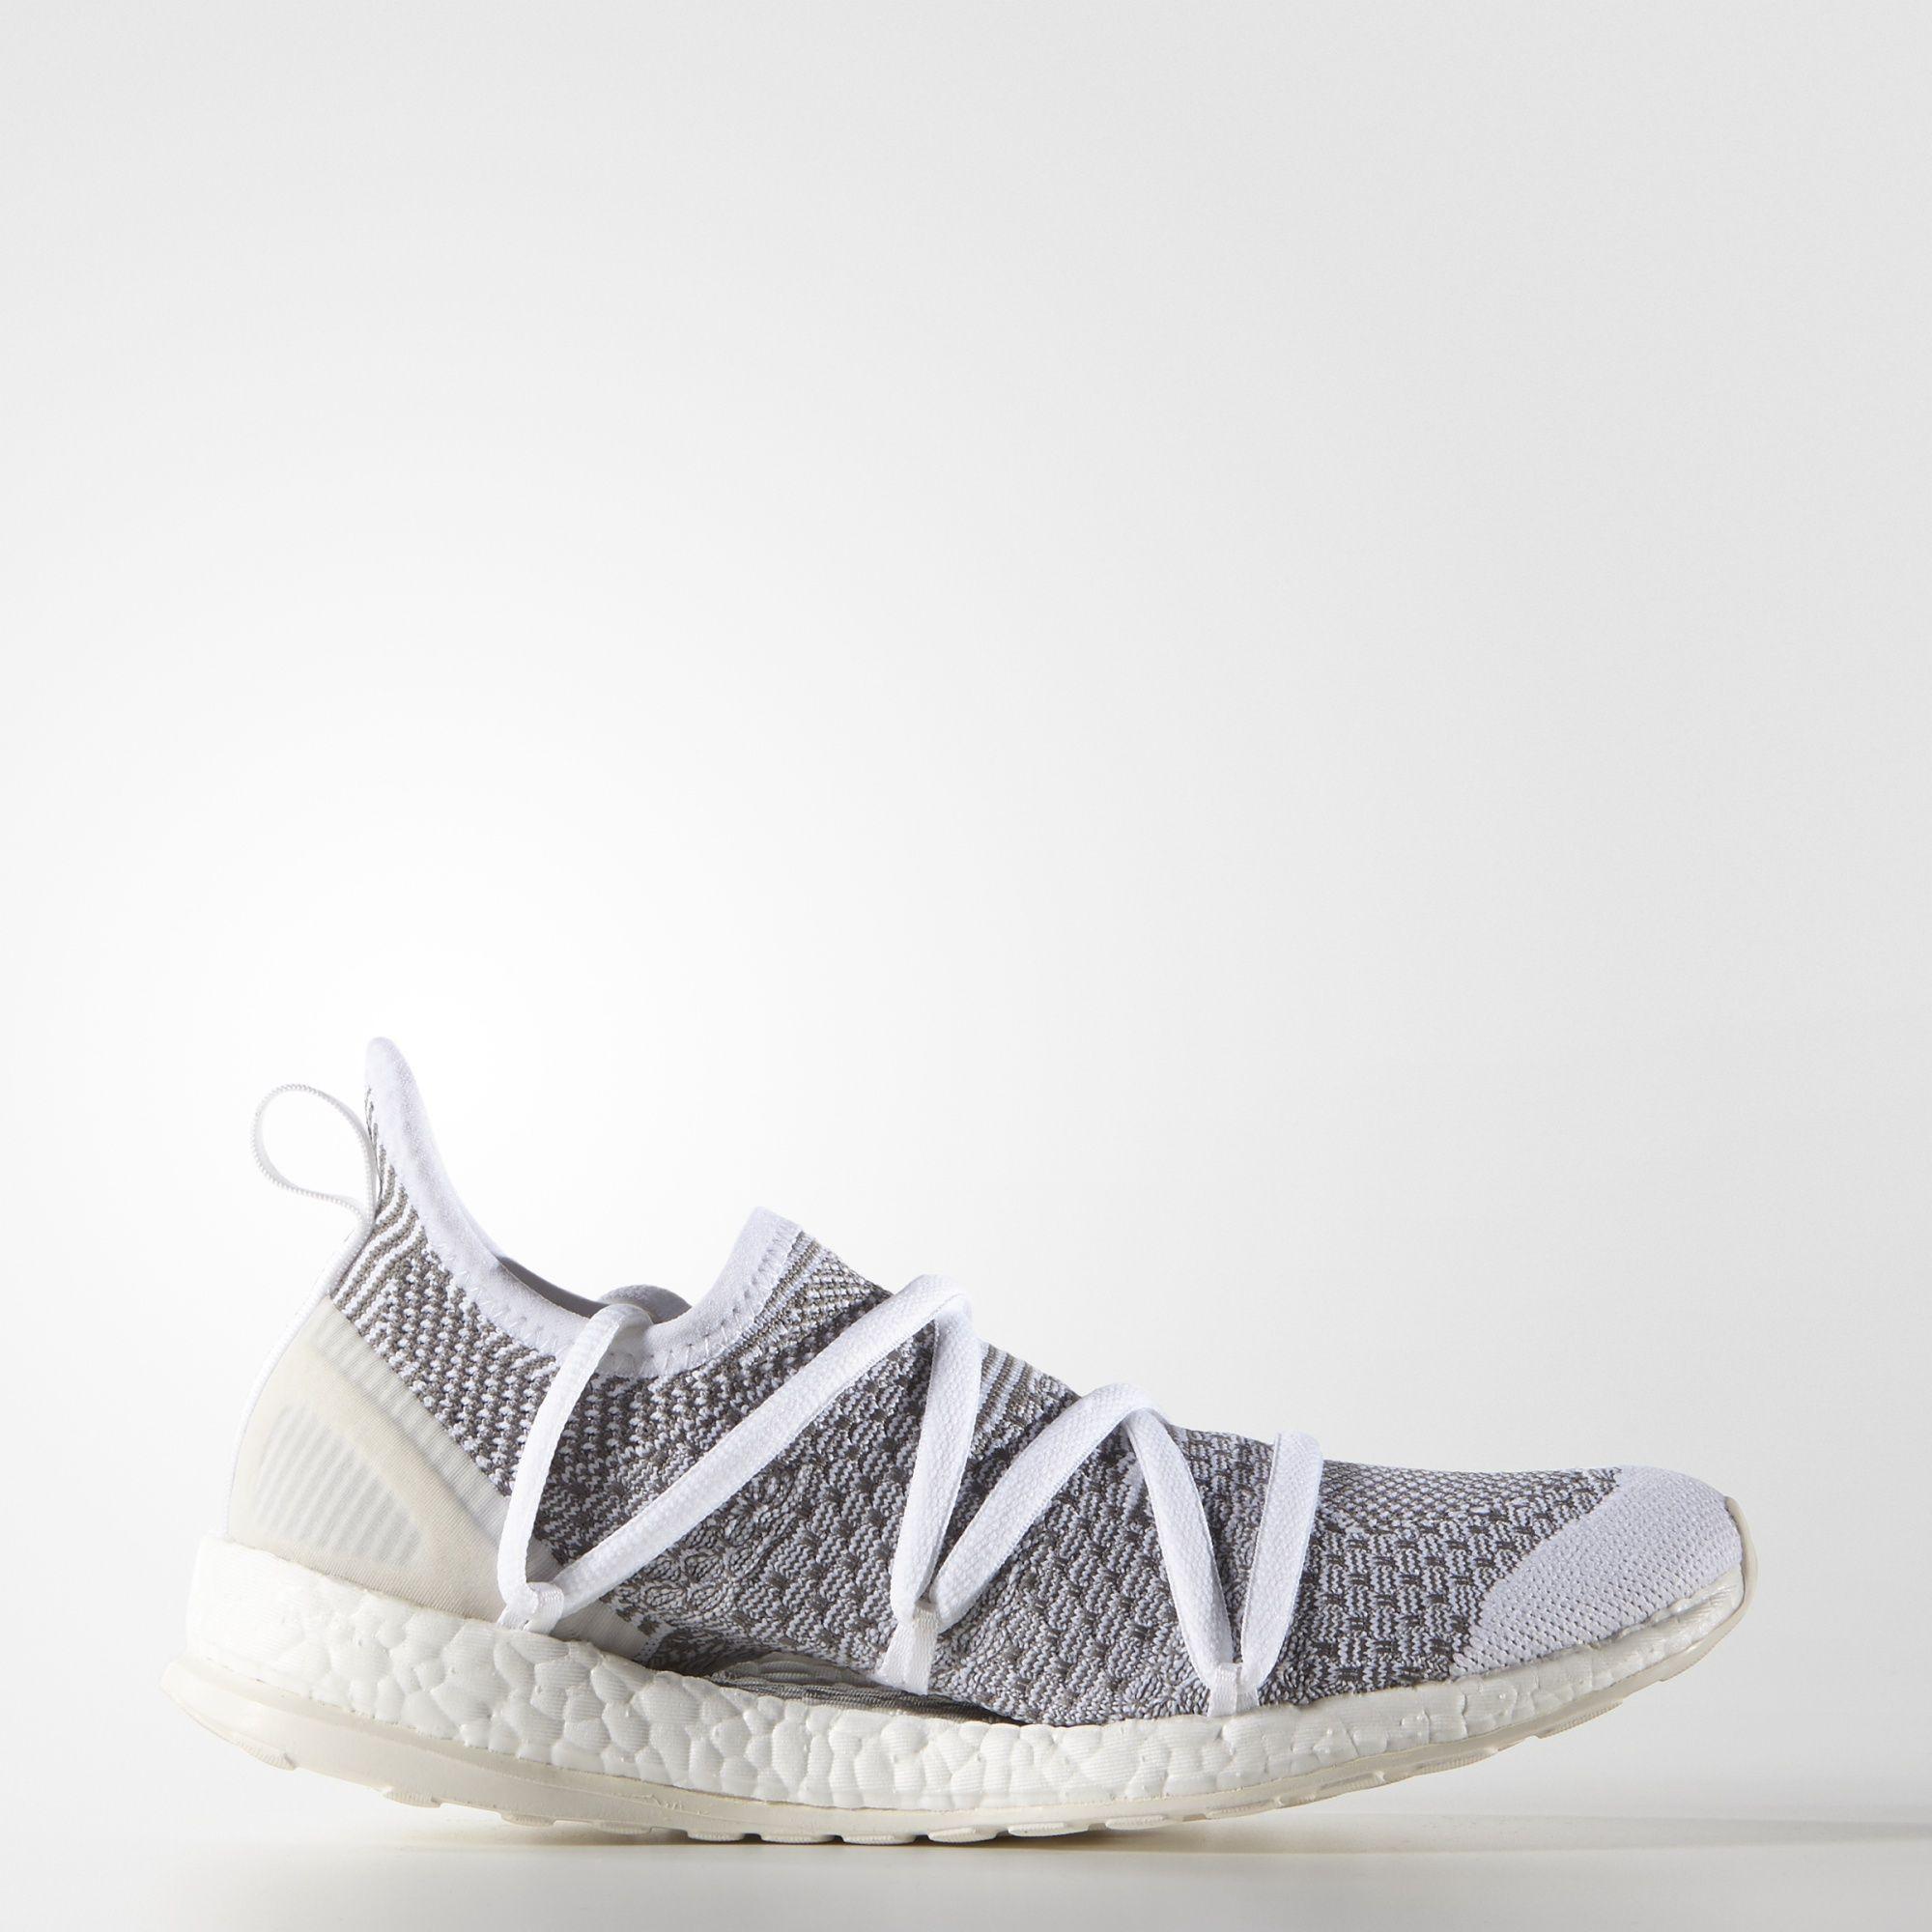 adidas bounce stella mcarthny adidas running shoes sports check